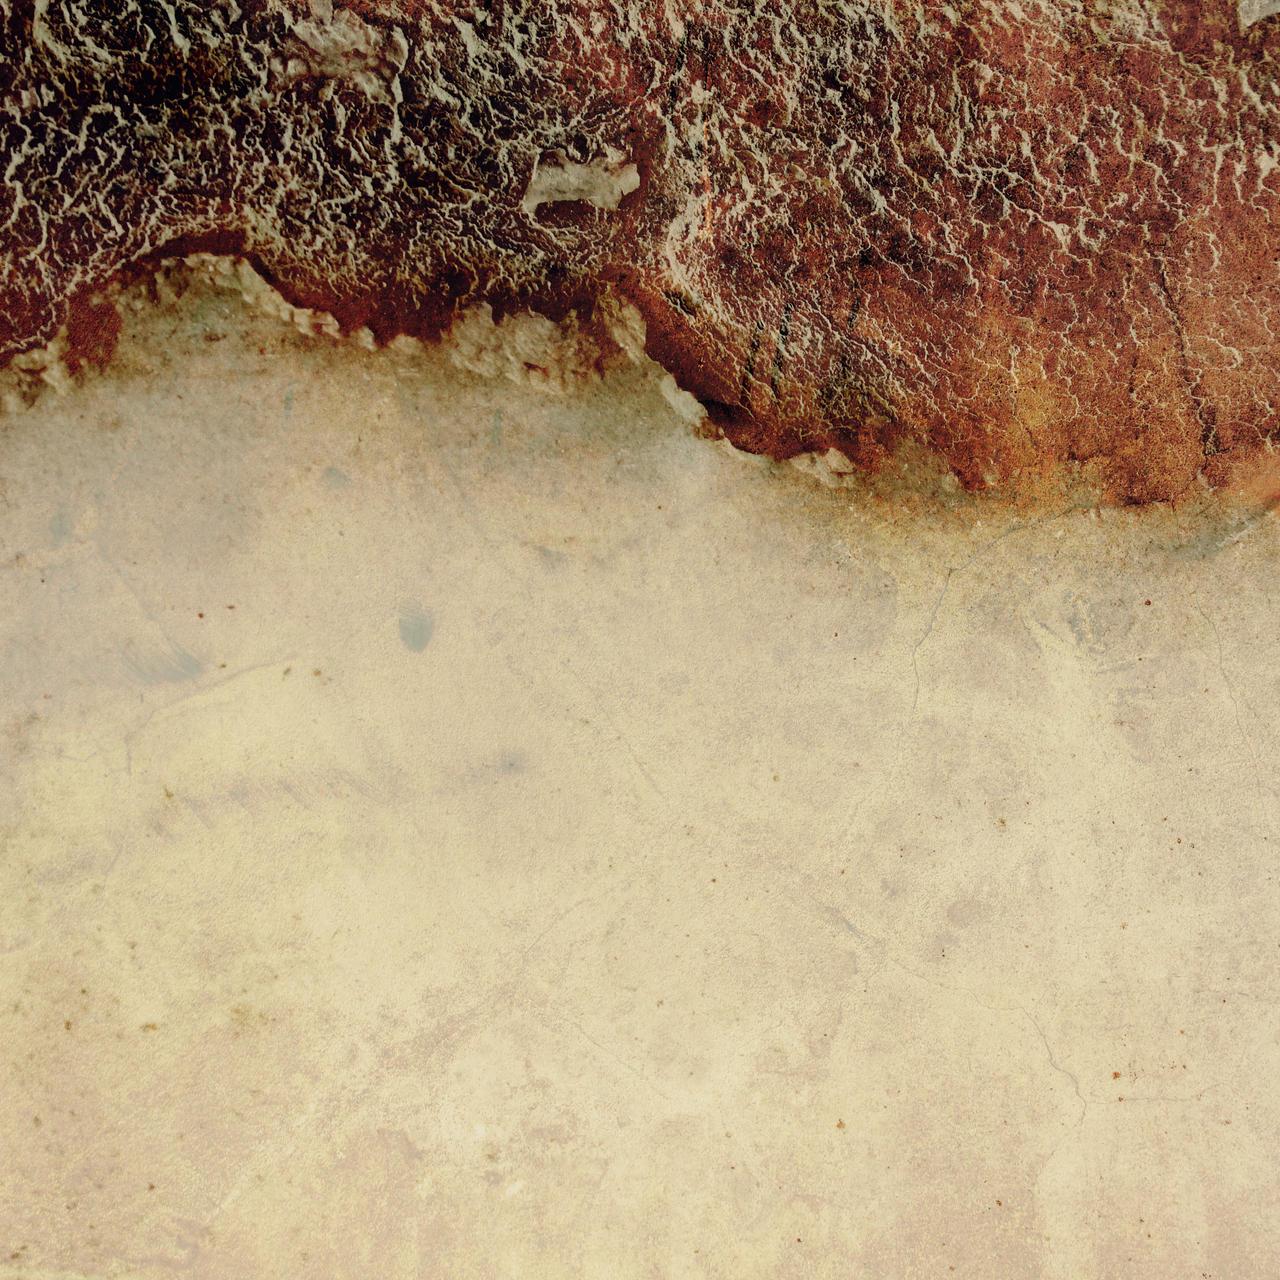 Digital Art Texture 107 by mercurycode